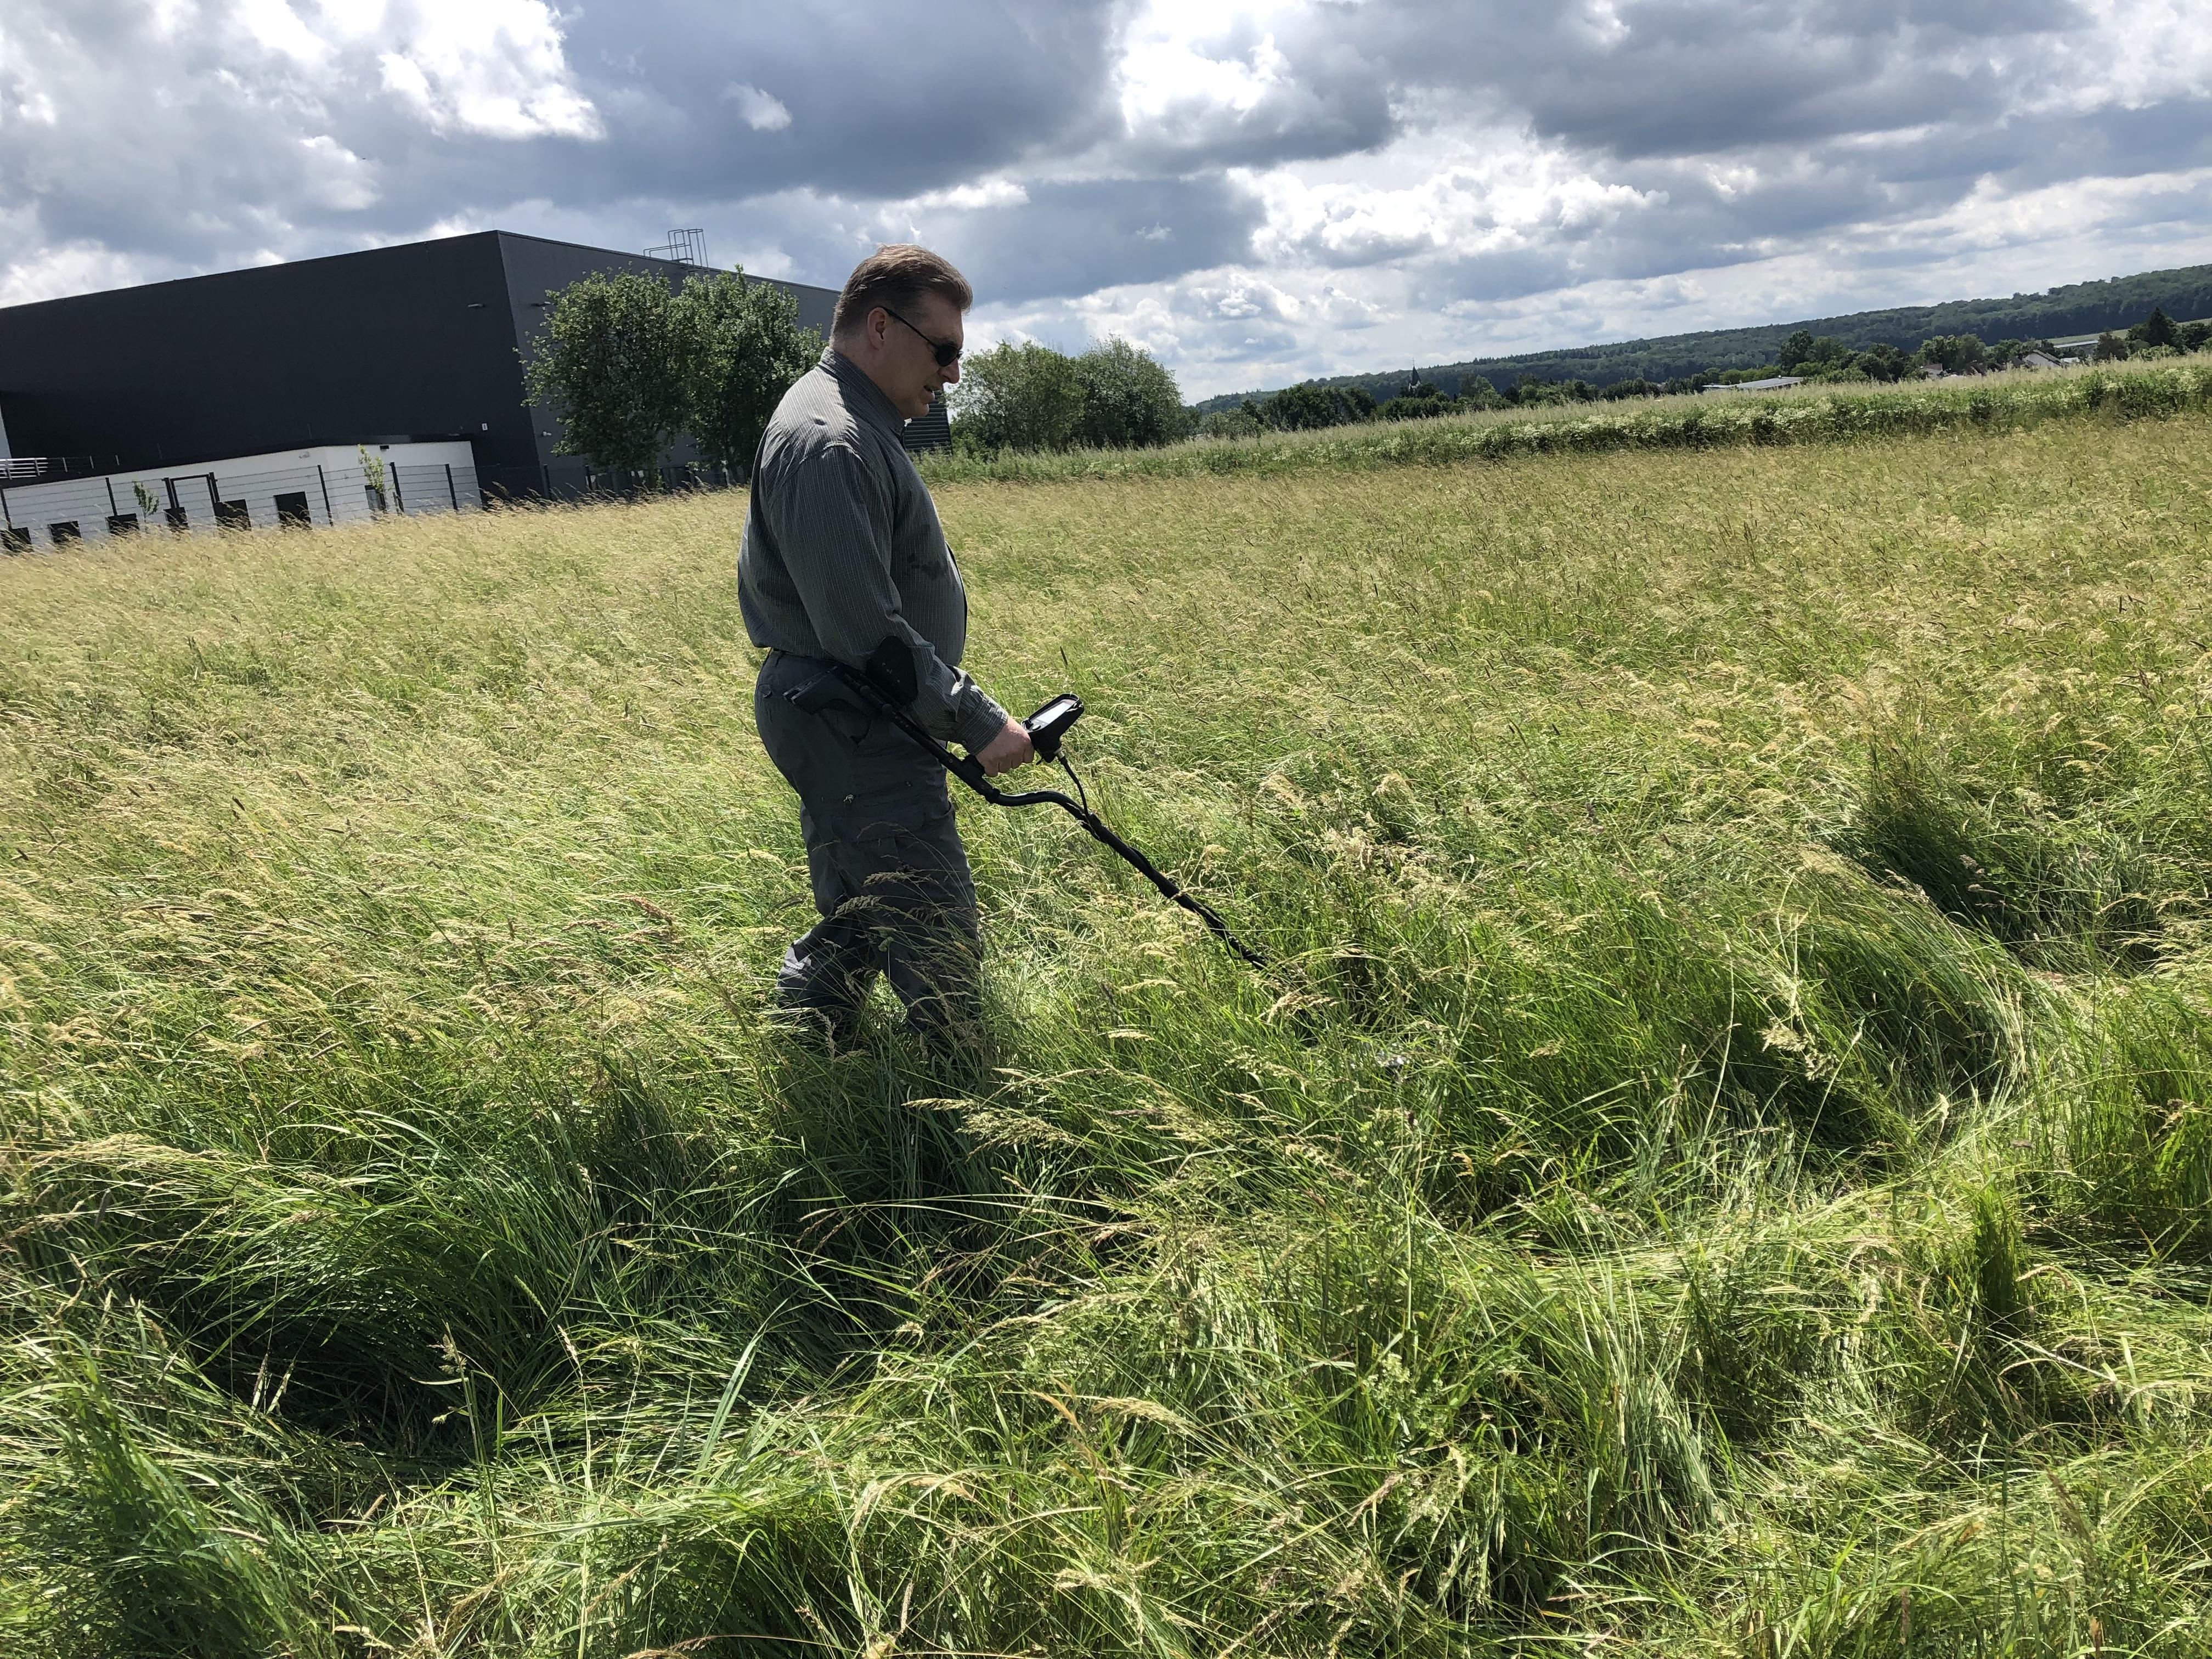 Verlorenes Handy im hohen Gras orten